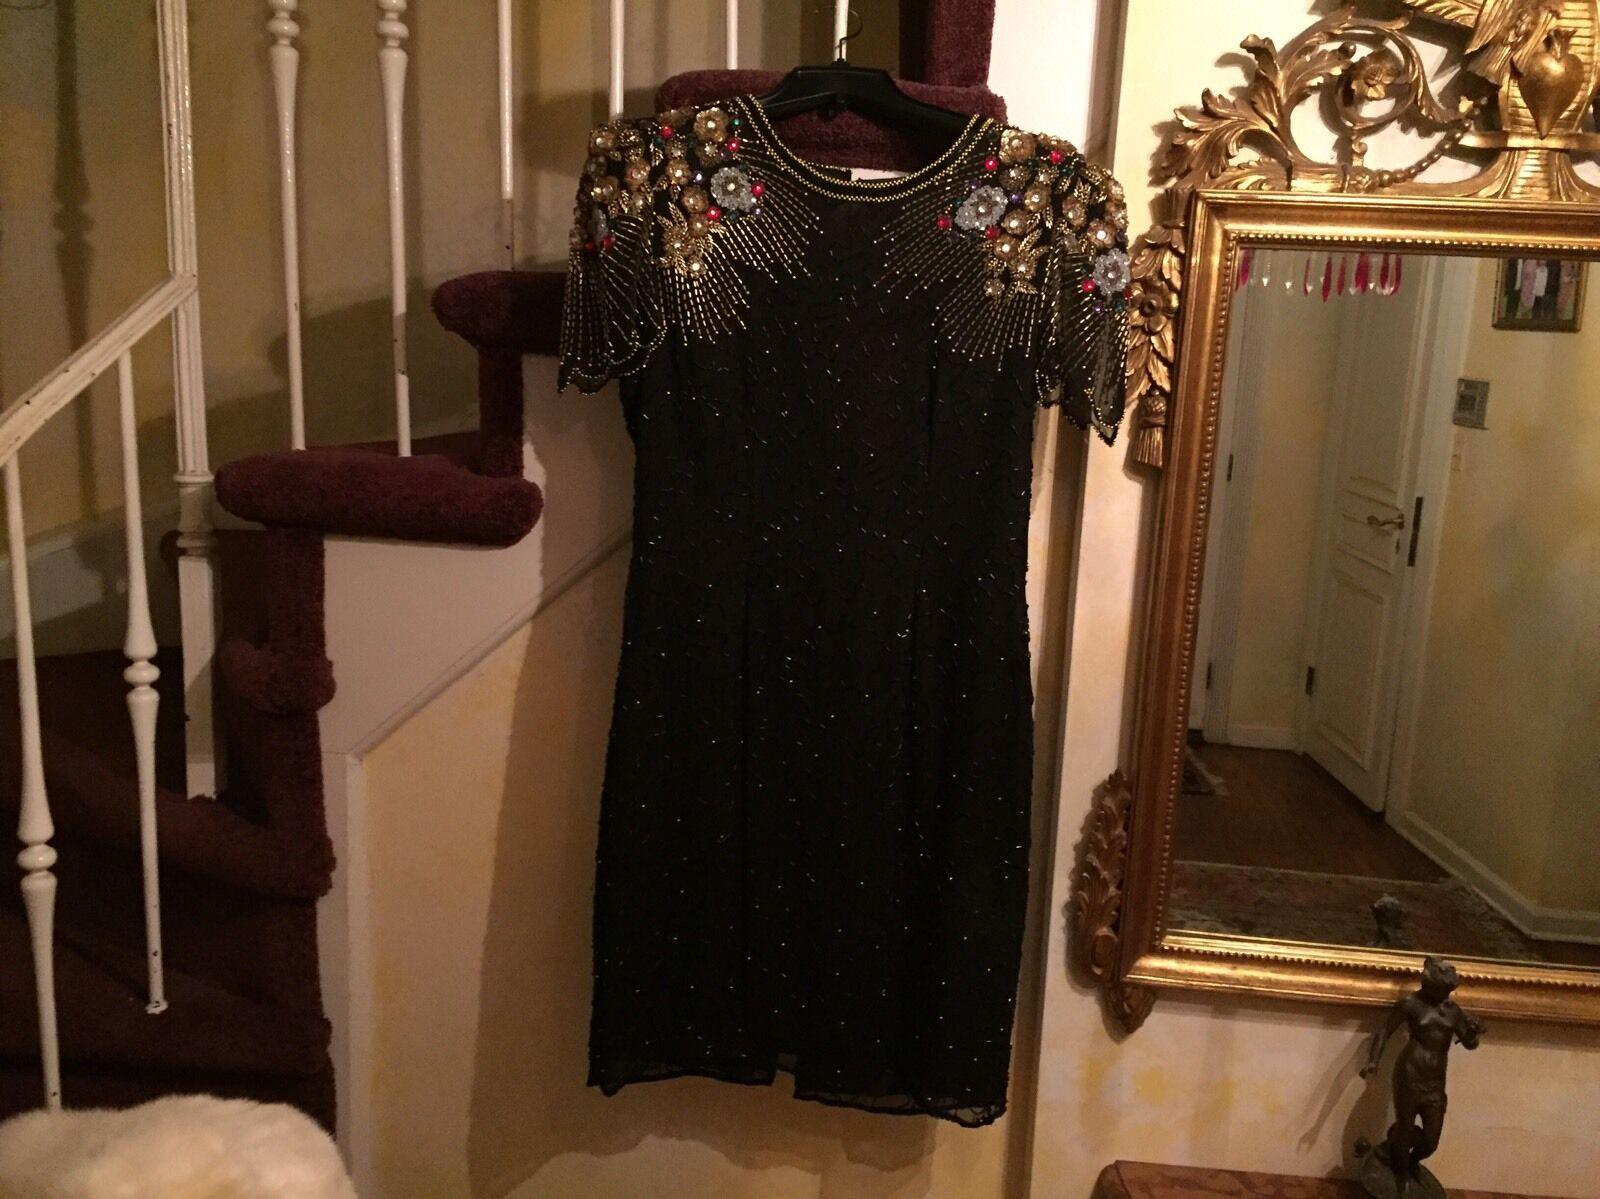 Vintage PEAK STARLINK DEVELOPMENT 100% SILK All SEQUIN EVENING DRESS L